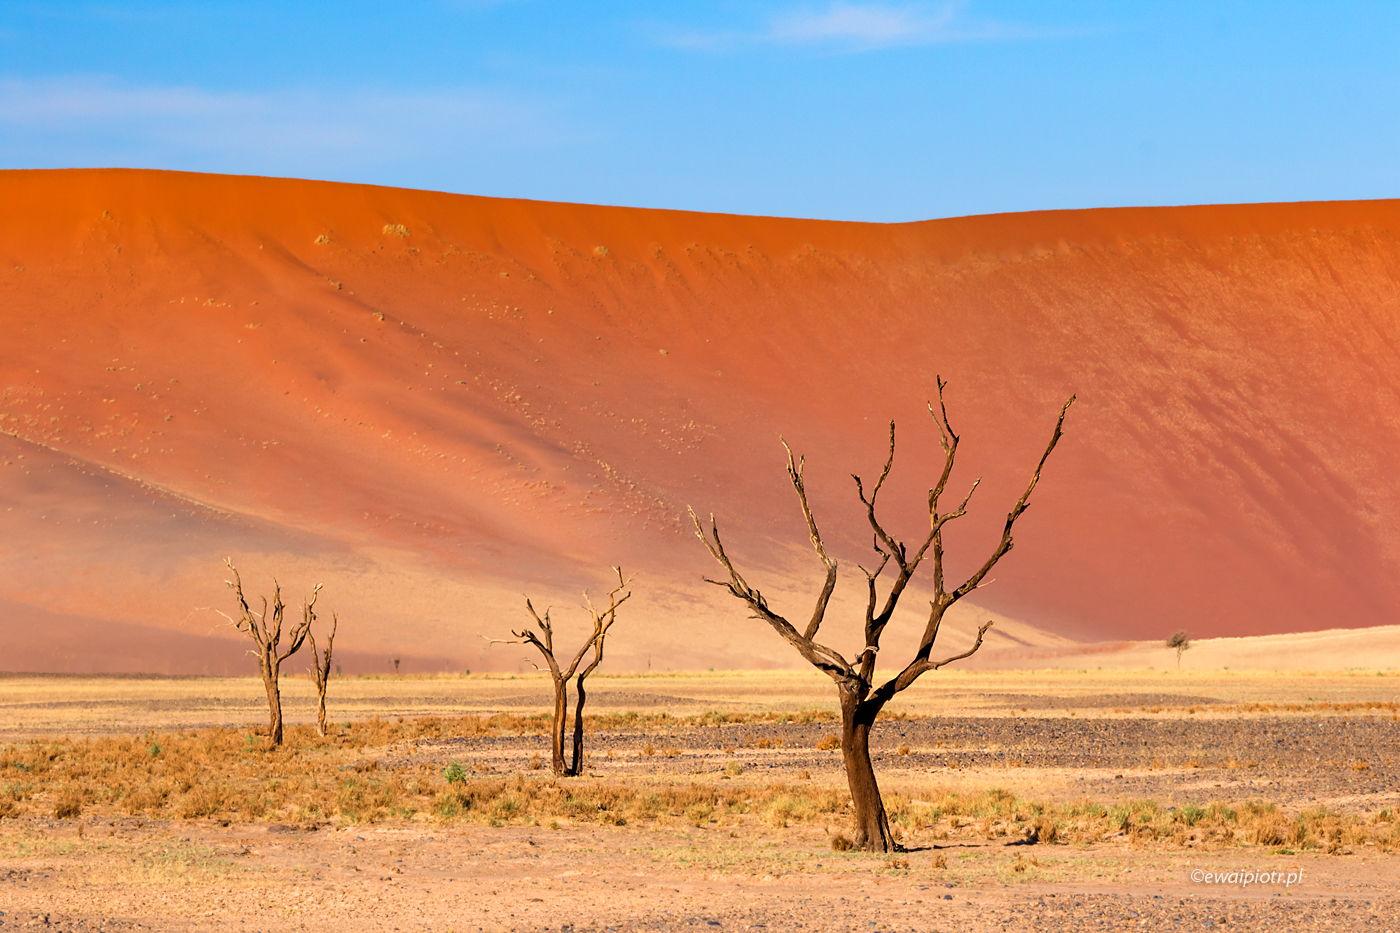 Drzewa pustyni Namib, Namibia, pozycja a perspektywa